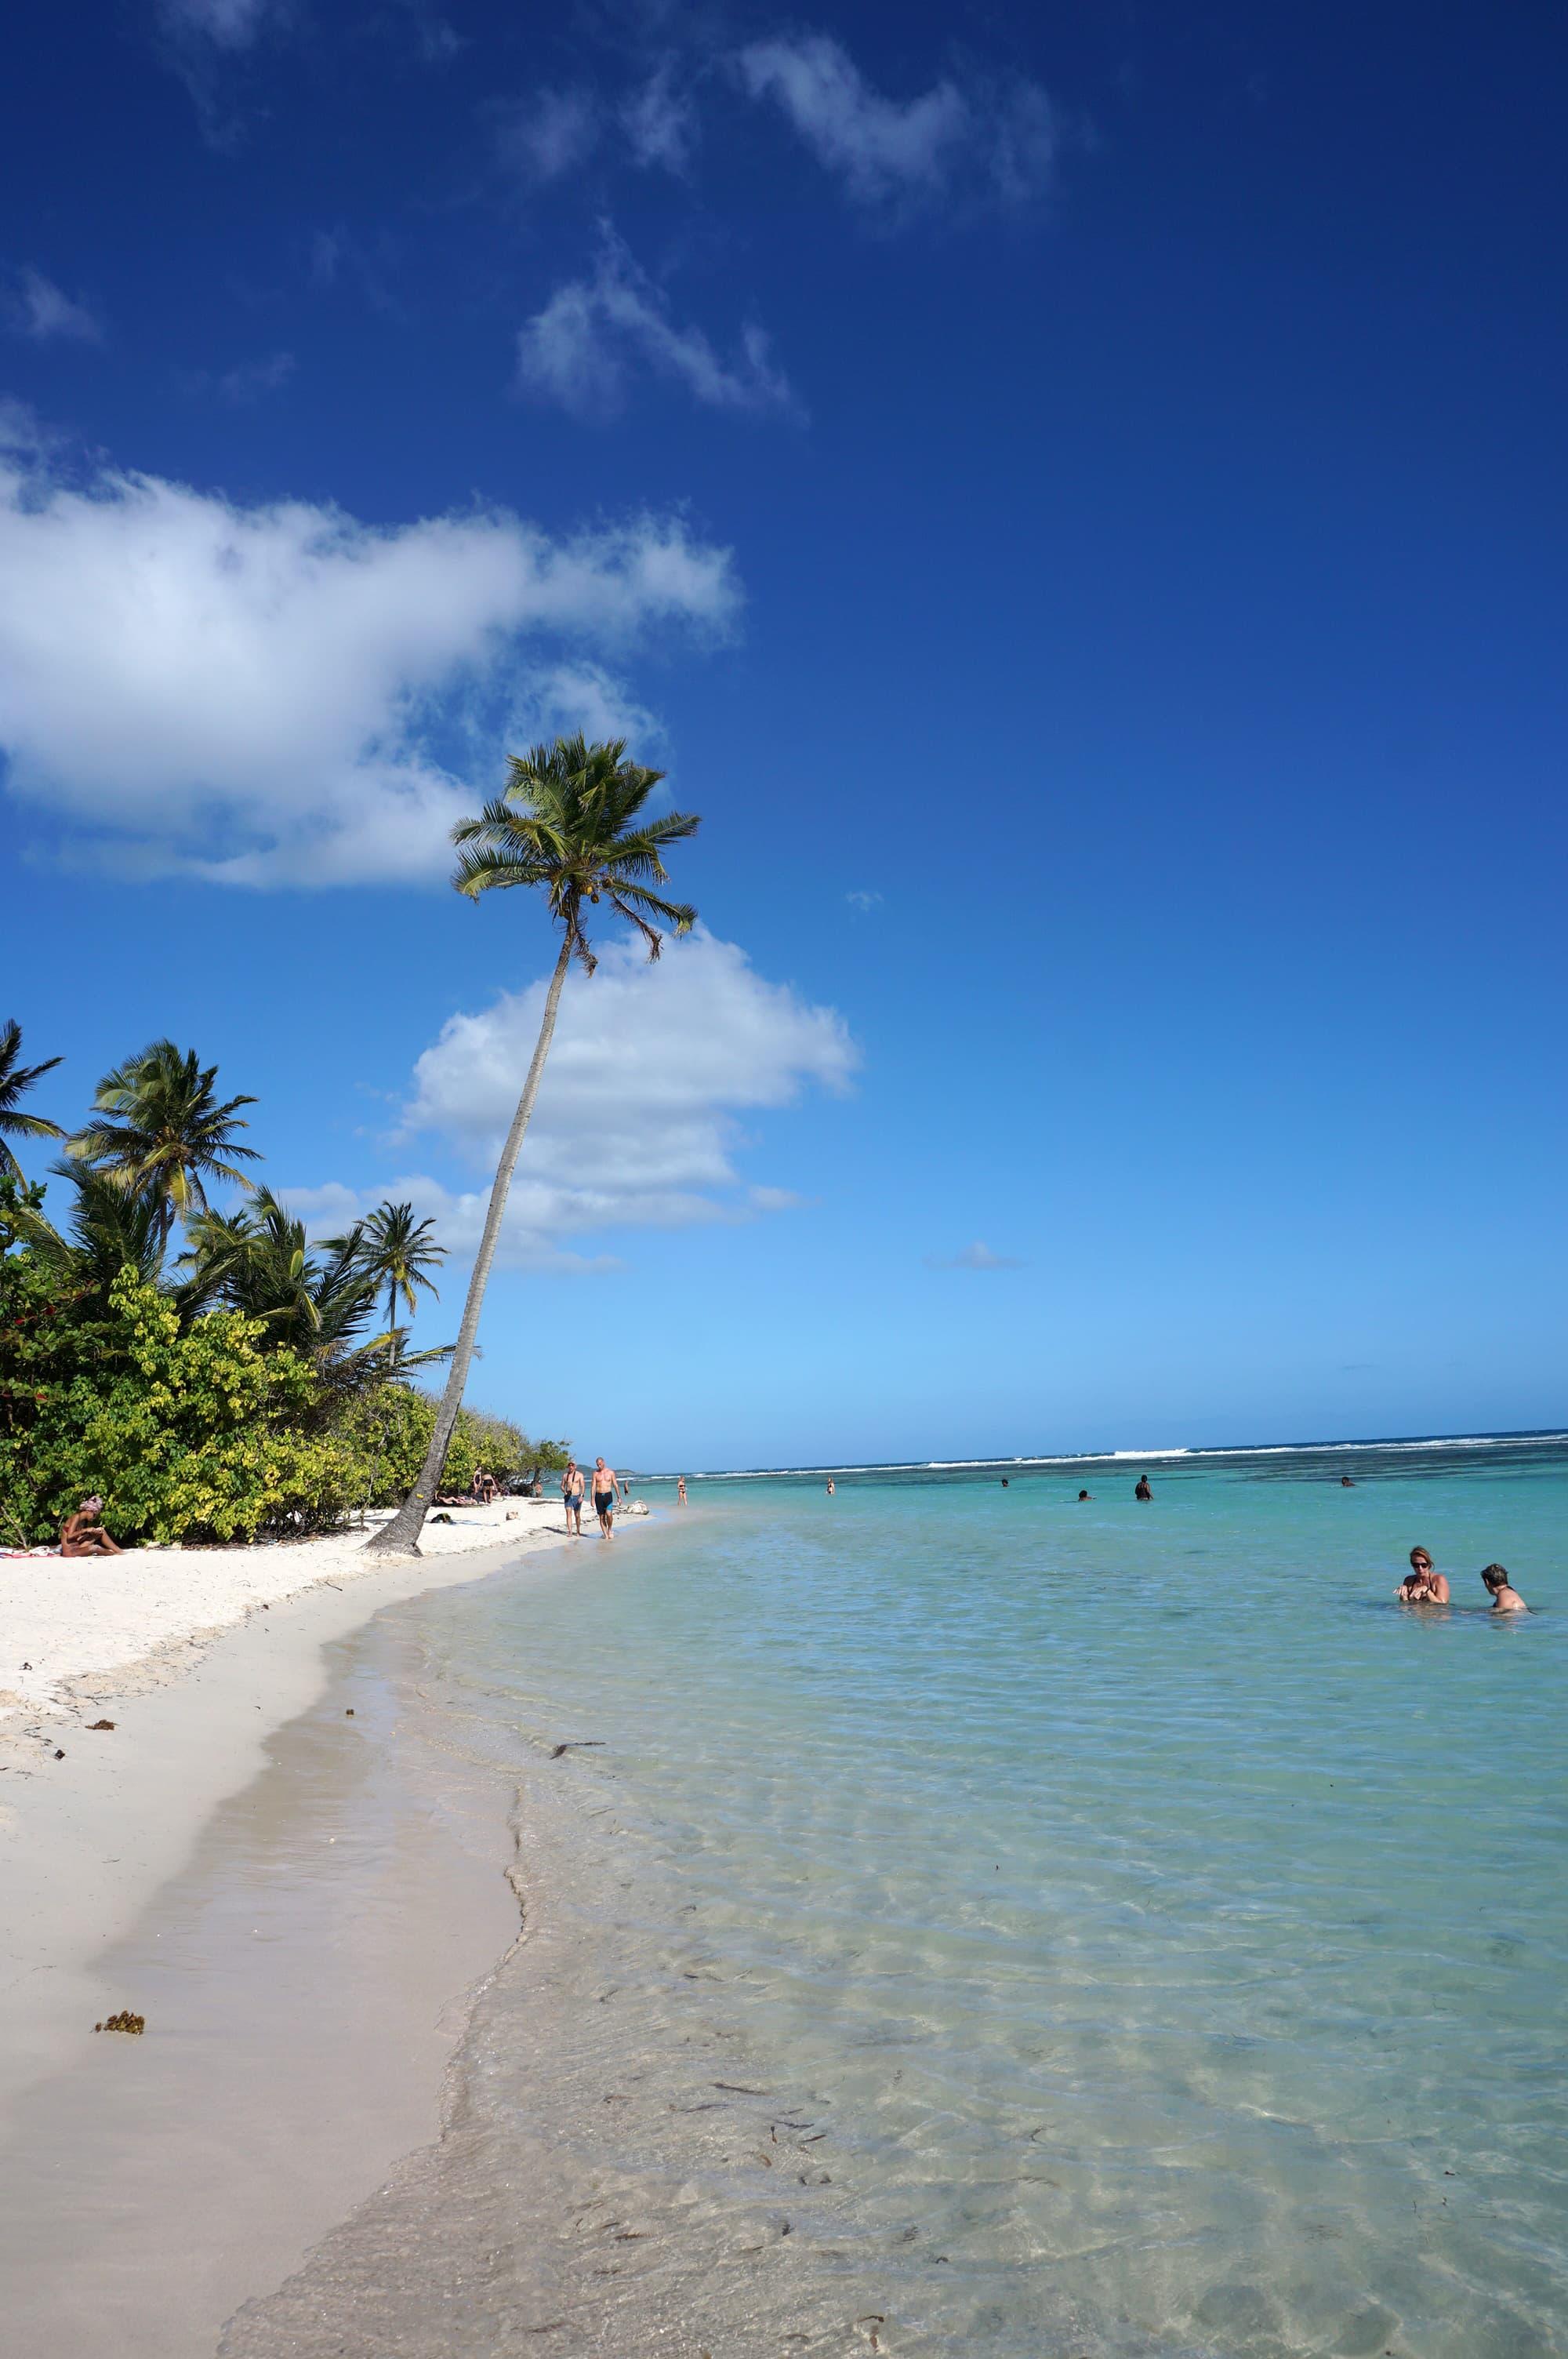 Belle plage en Guadeloupe : la plage de Bois Jolan